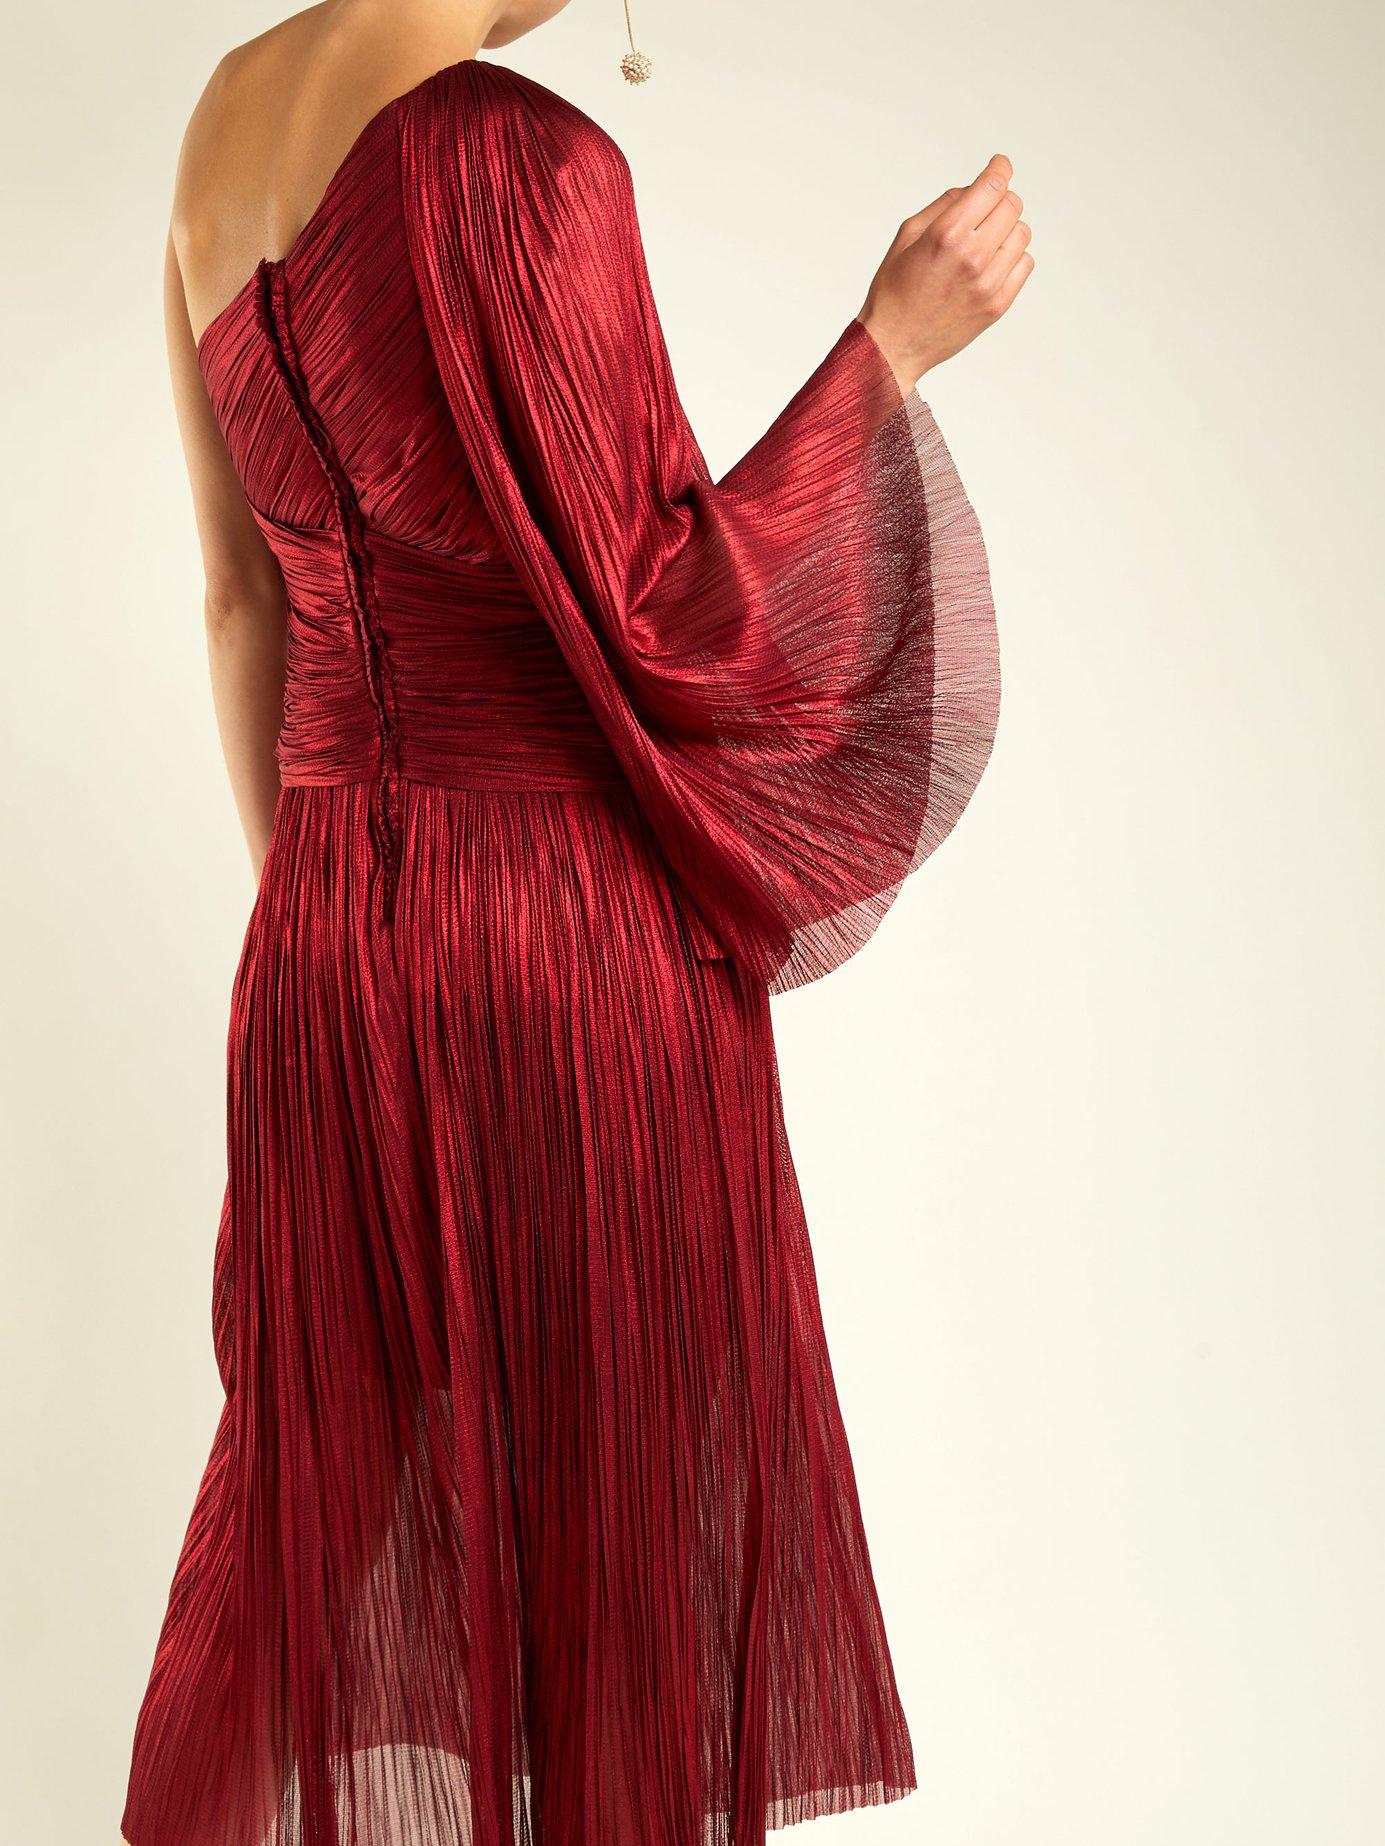 Aquila one-shoulder silk dress by Maria Lucia Hohan